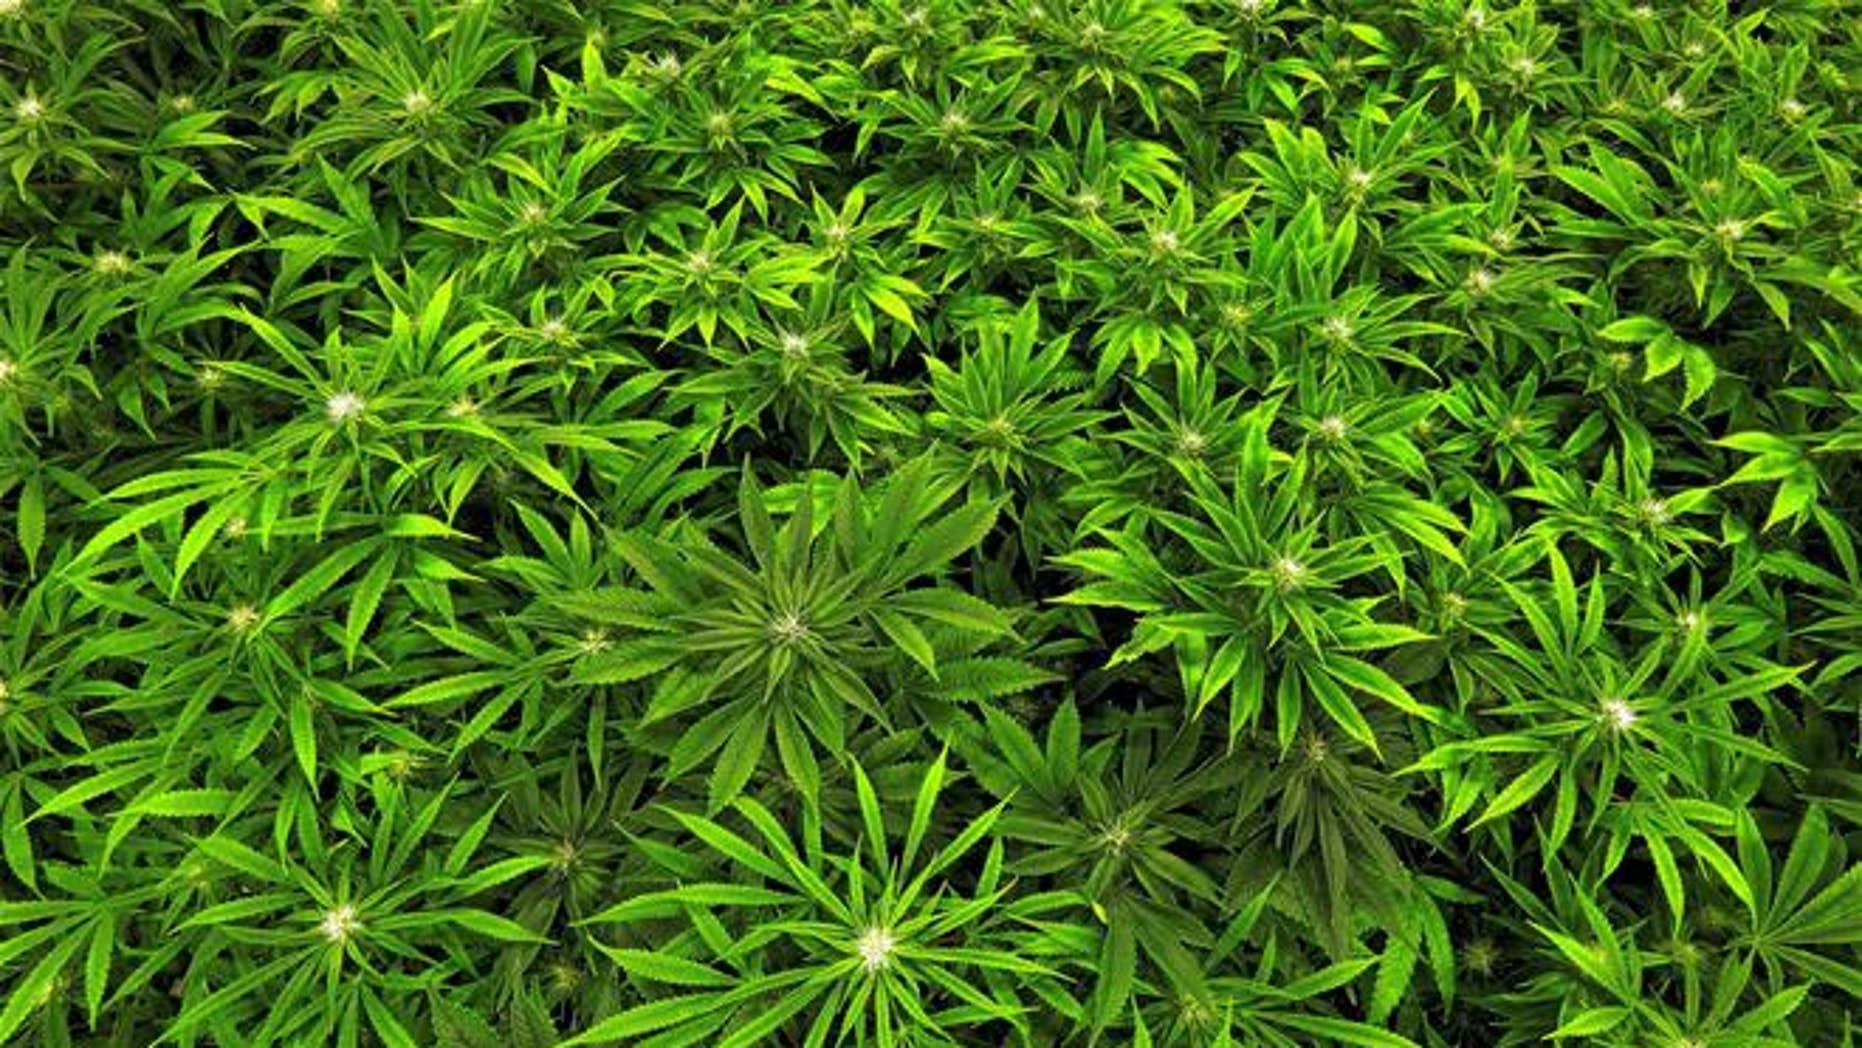 Marijuana grows at a medical marijuana cultivation center in Illinois.